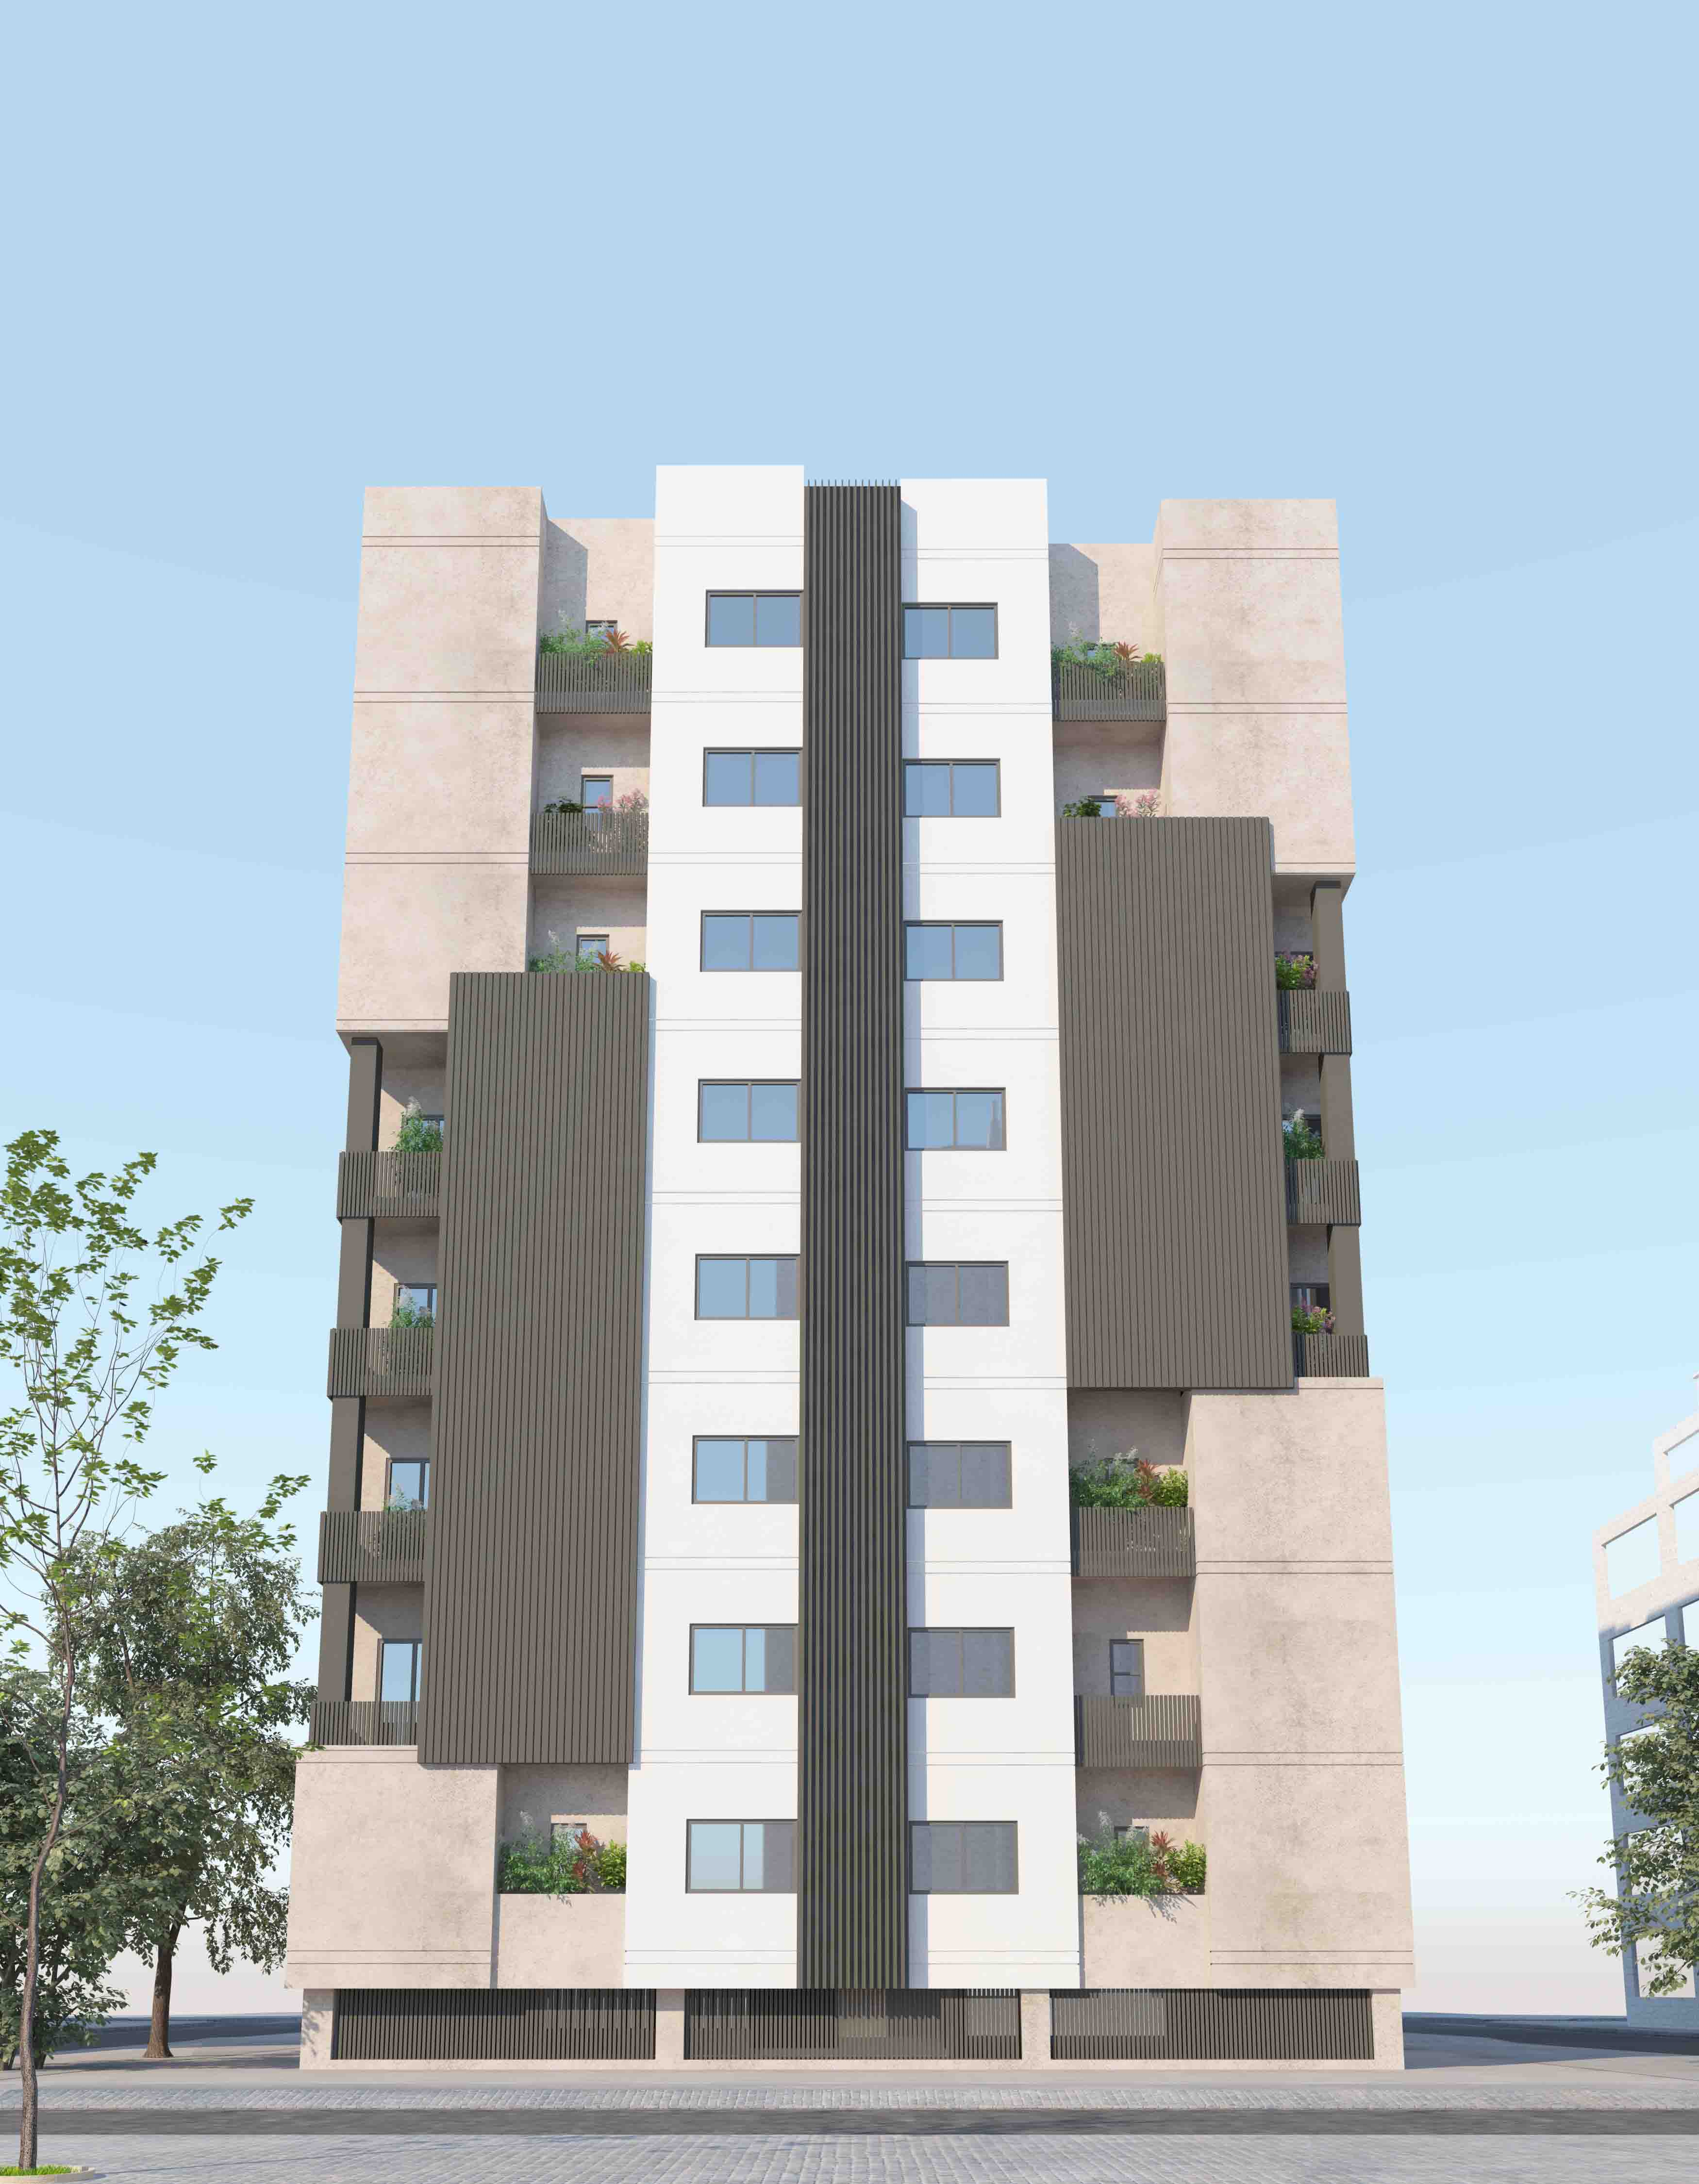 al-karim-residence-h13-building.jpg